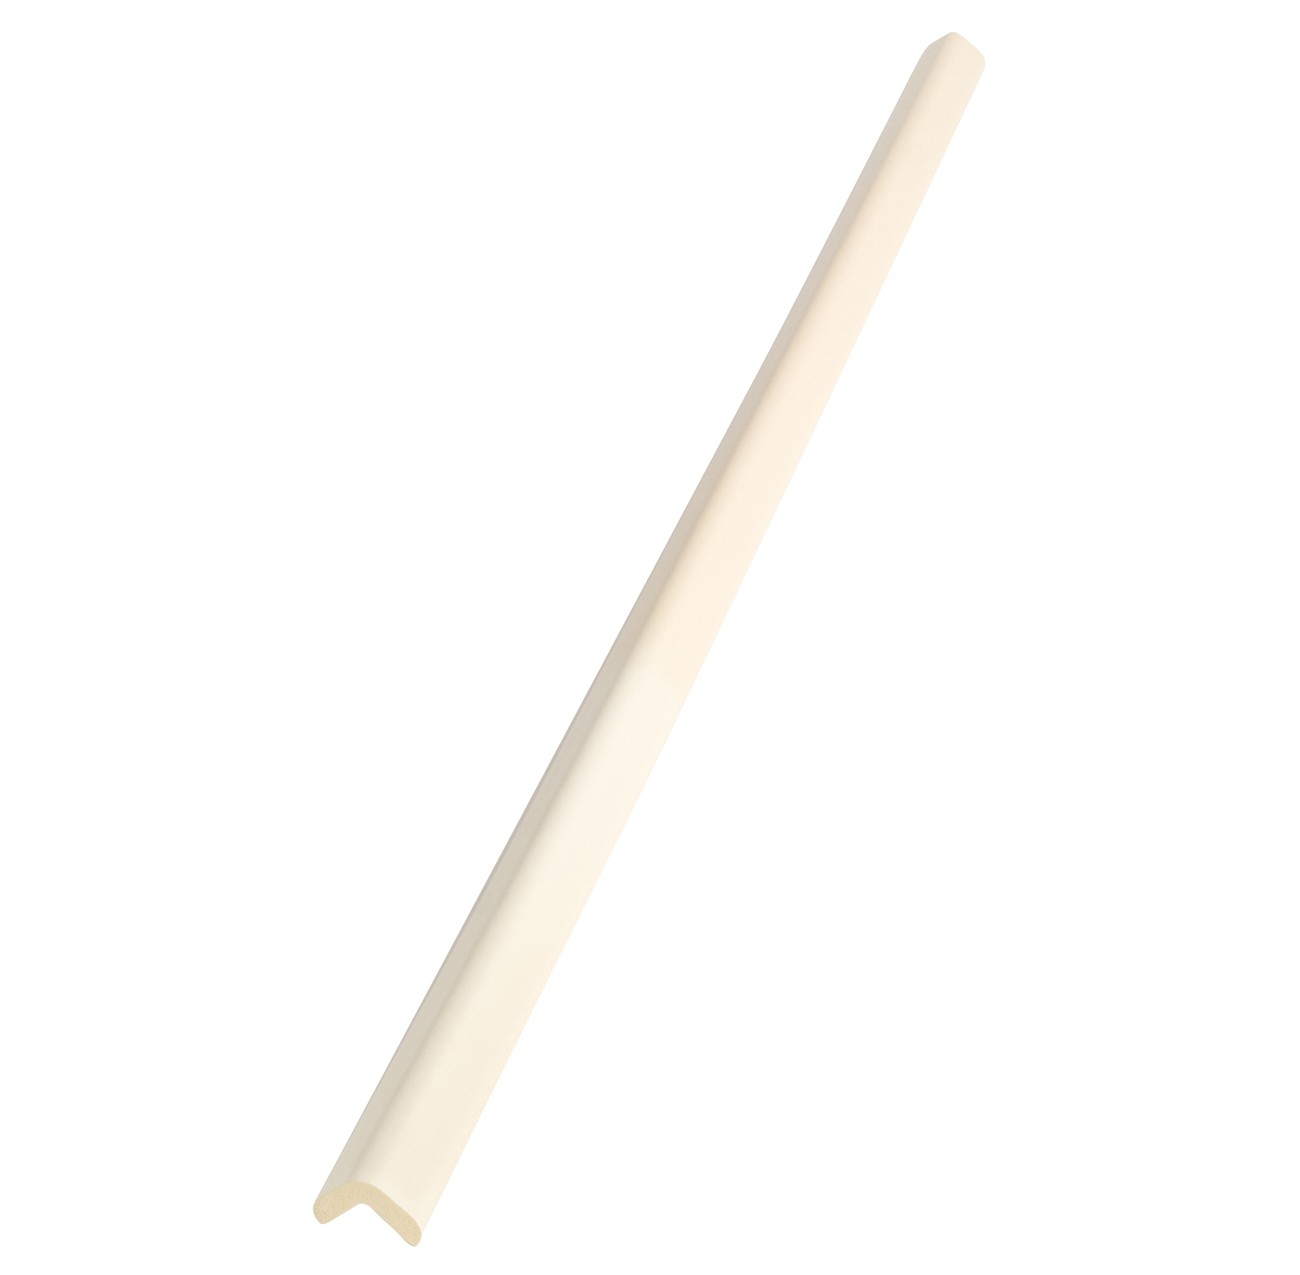 Protectie colt din spuma de cauciuc AC-15, crem, 90 cm, grosime 9 mm